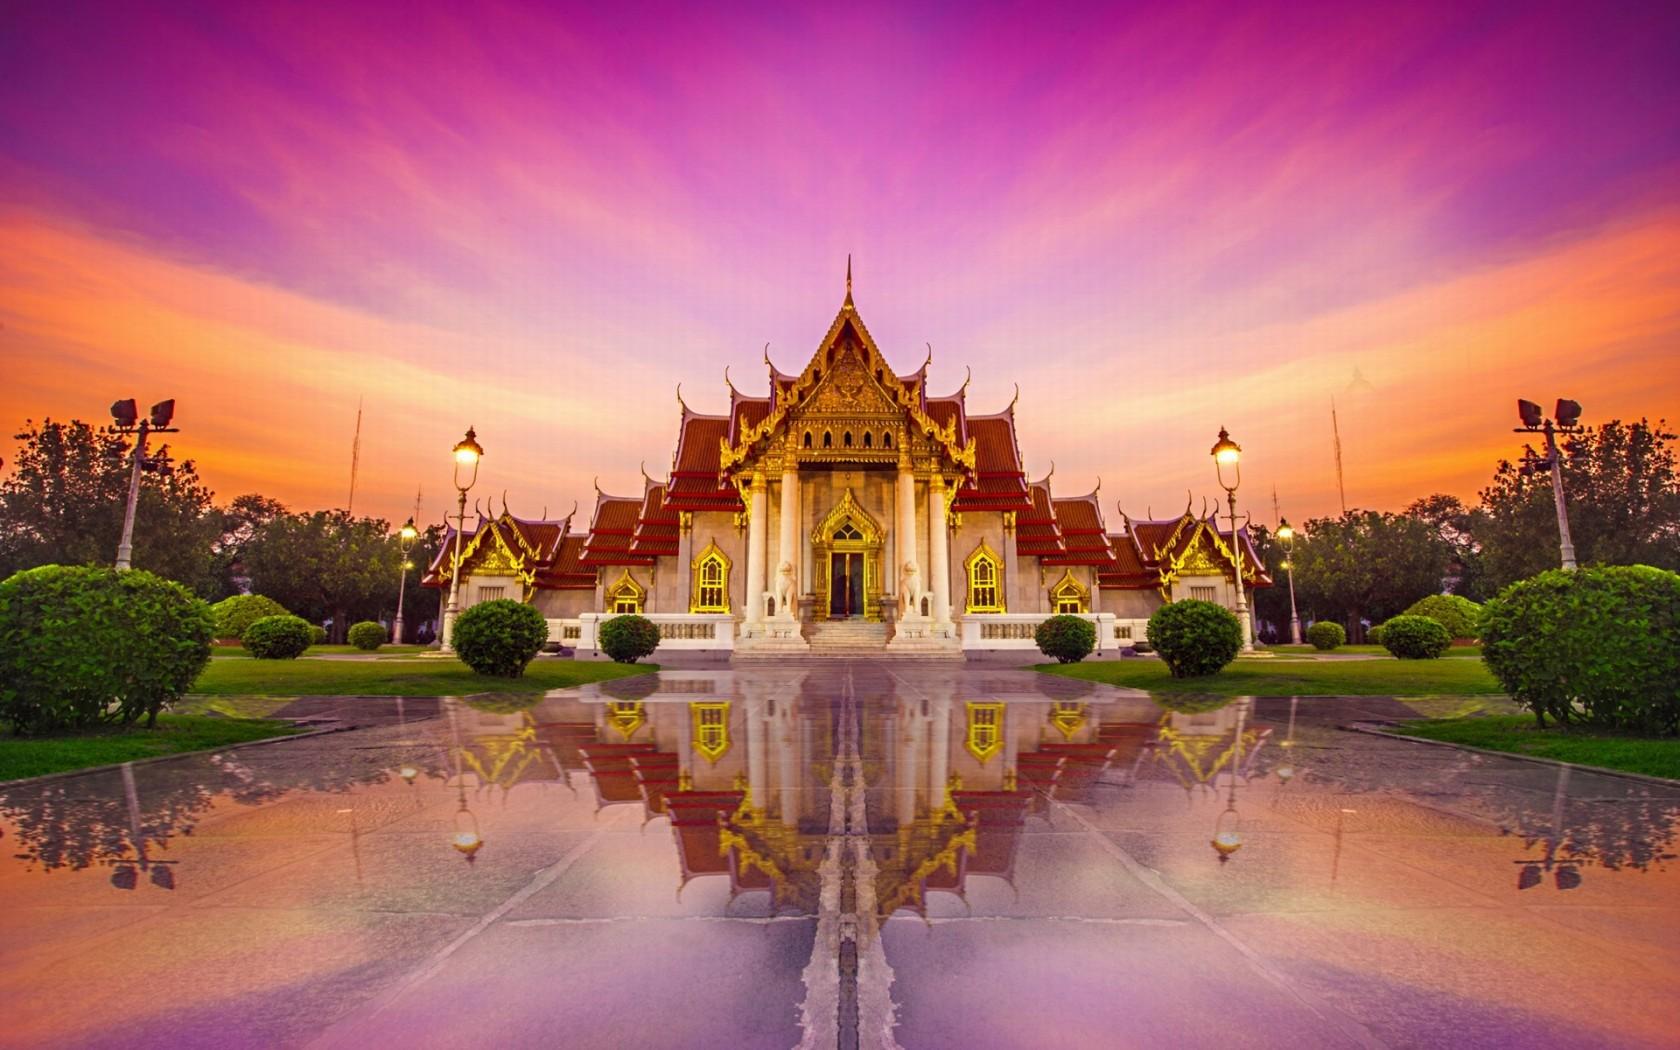 wat-benchamabophit-thailand-wallpaper